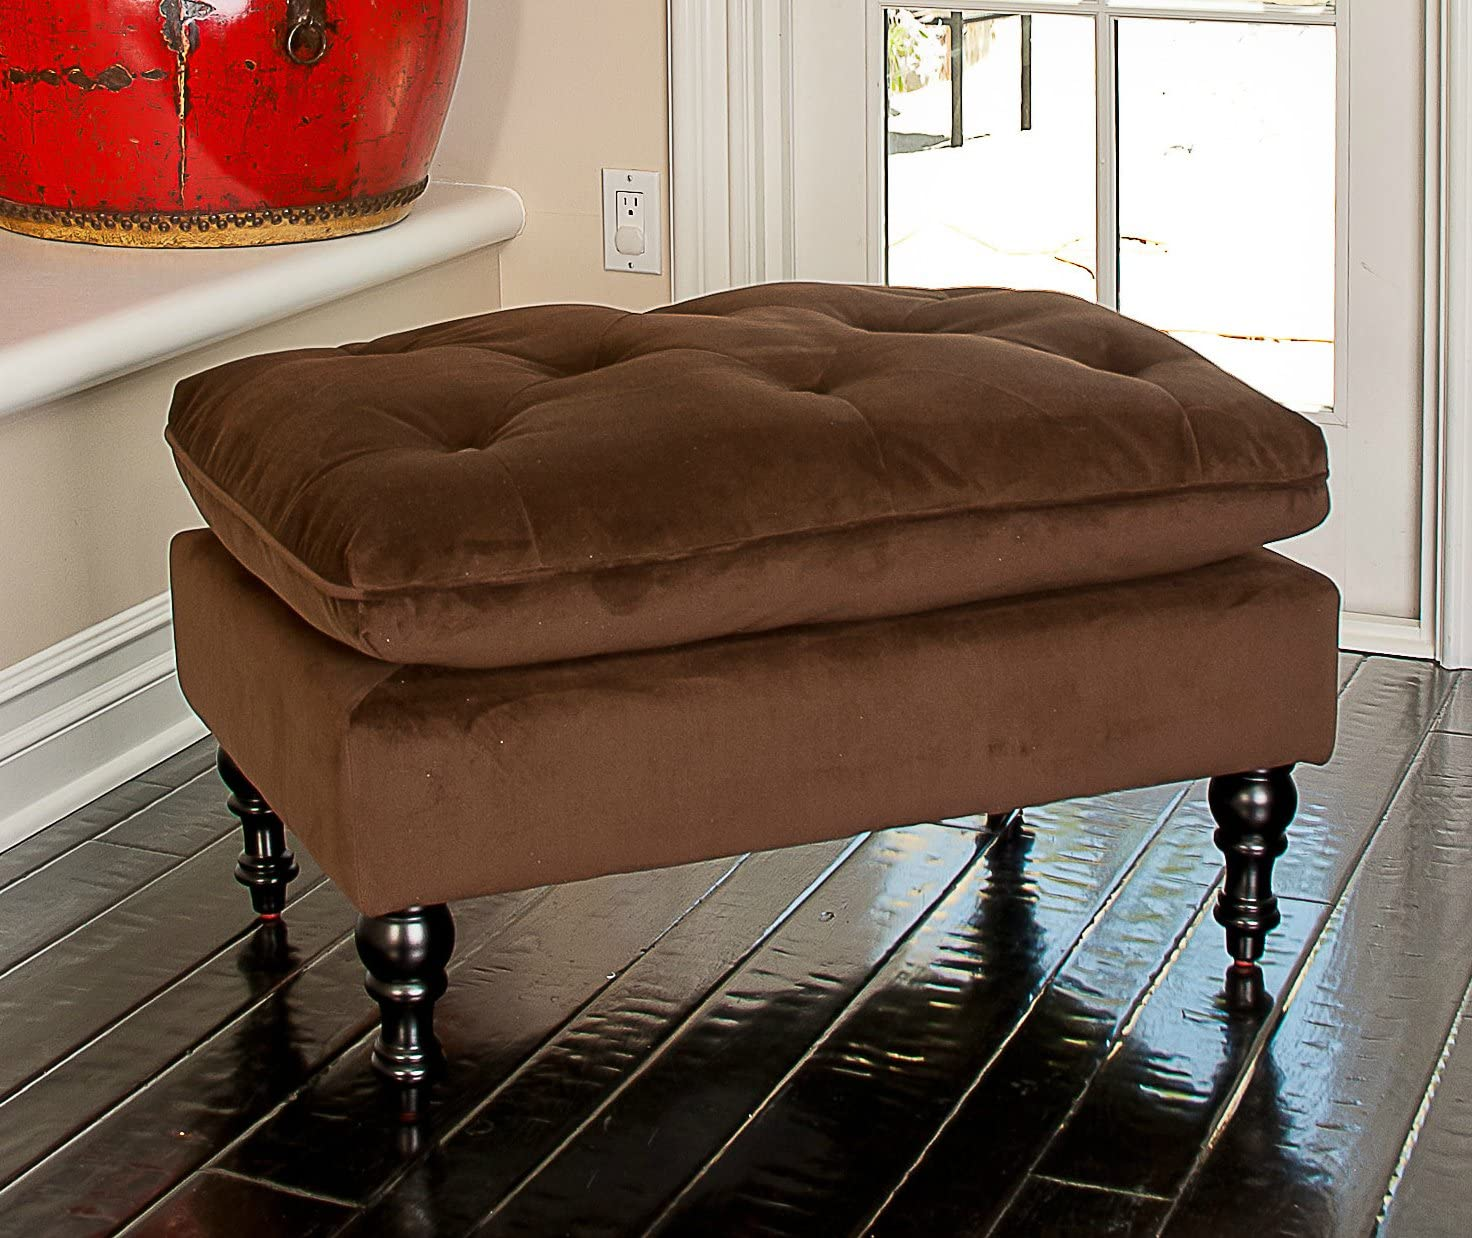 Amazon.com: Jemsu Pouf Ottoman Footstool Chair Living Room ...